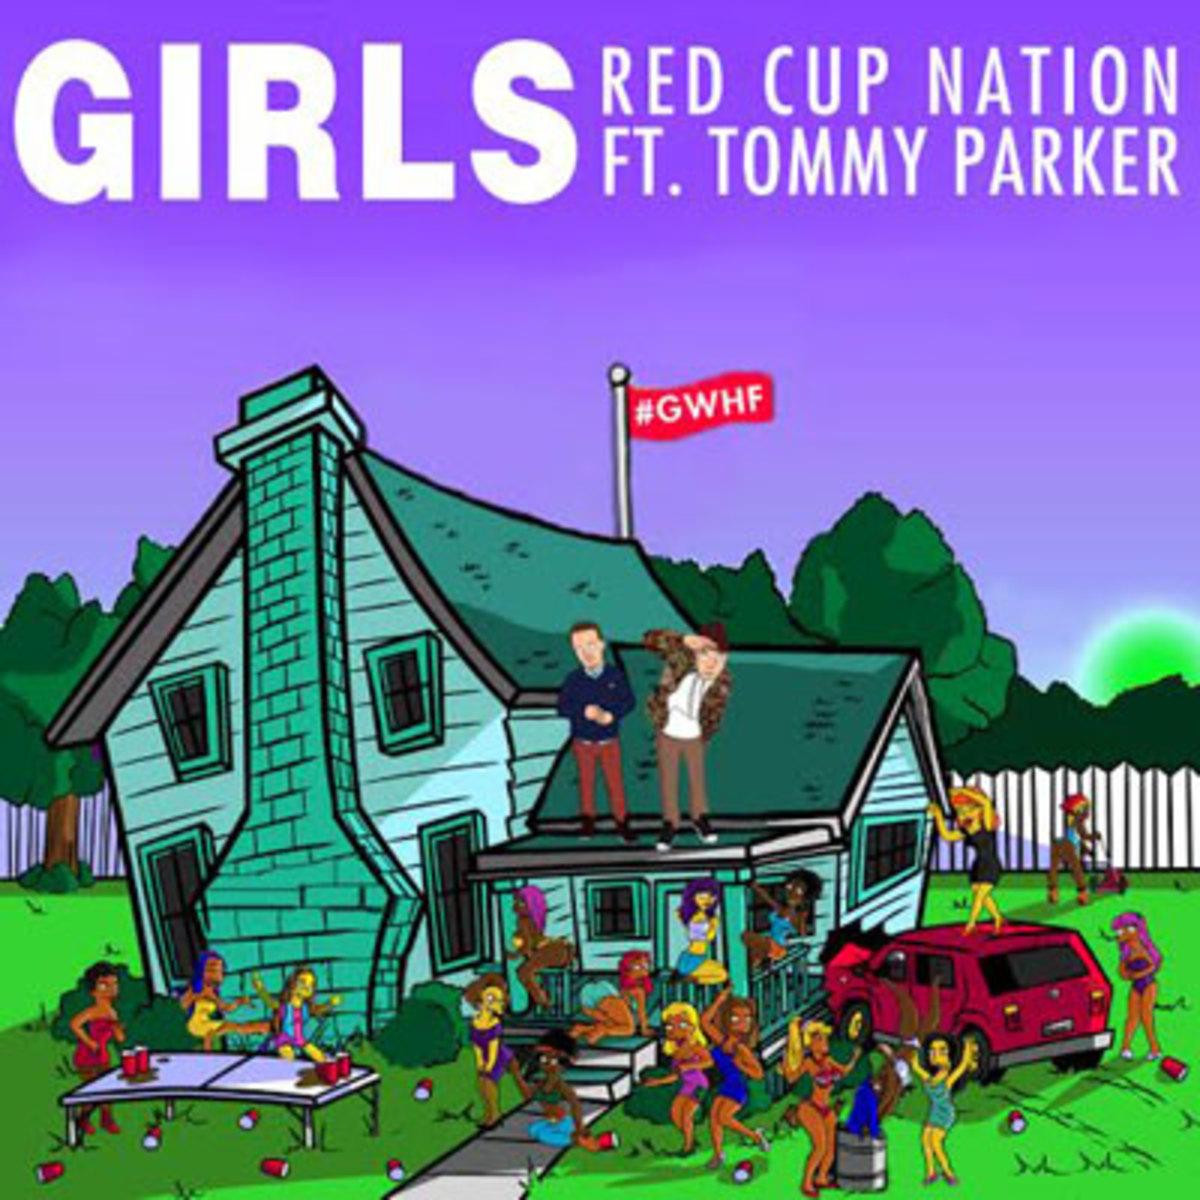 redcupnation-girls.jpg